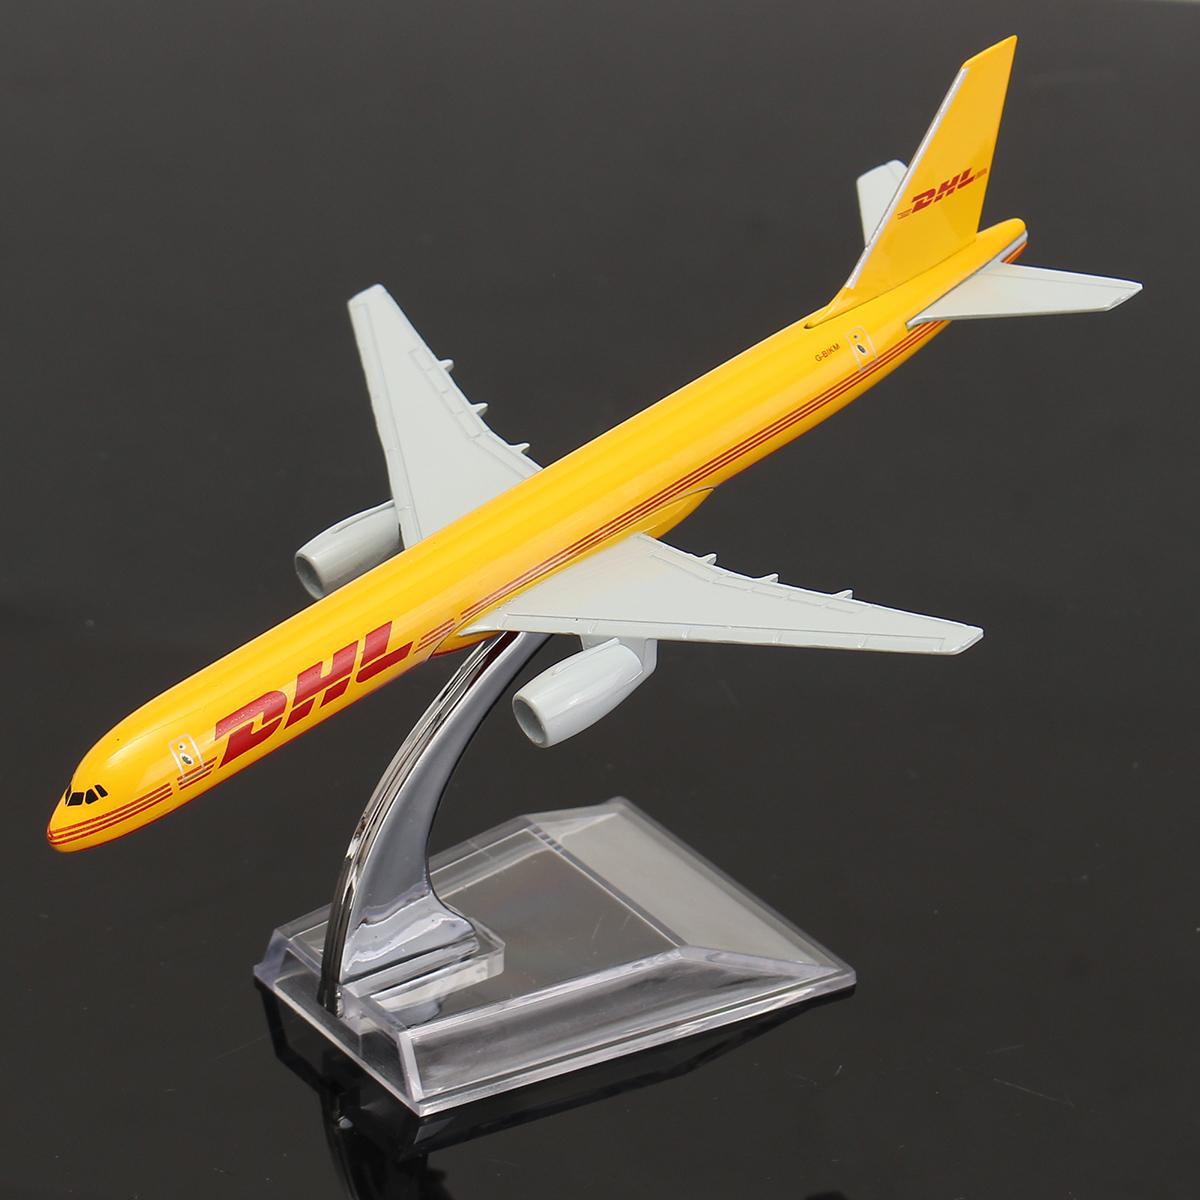 Airplane 16cm Metal Plane Model Aircraft B757 DHL Kargo